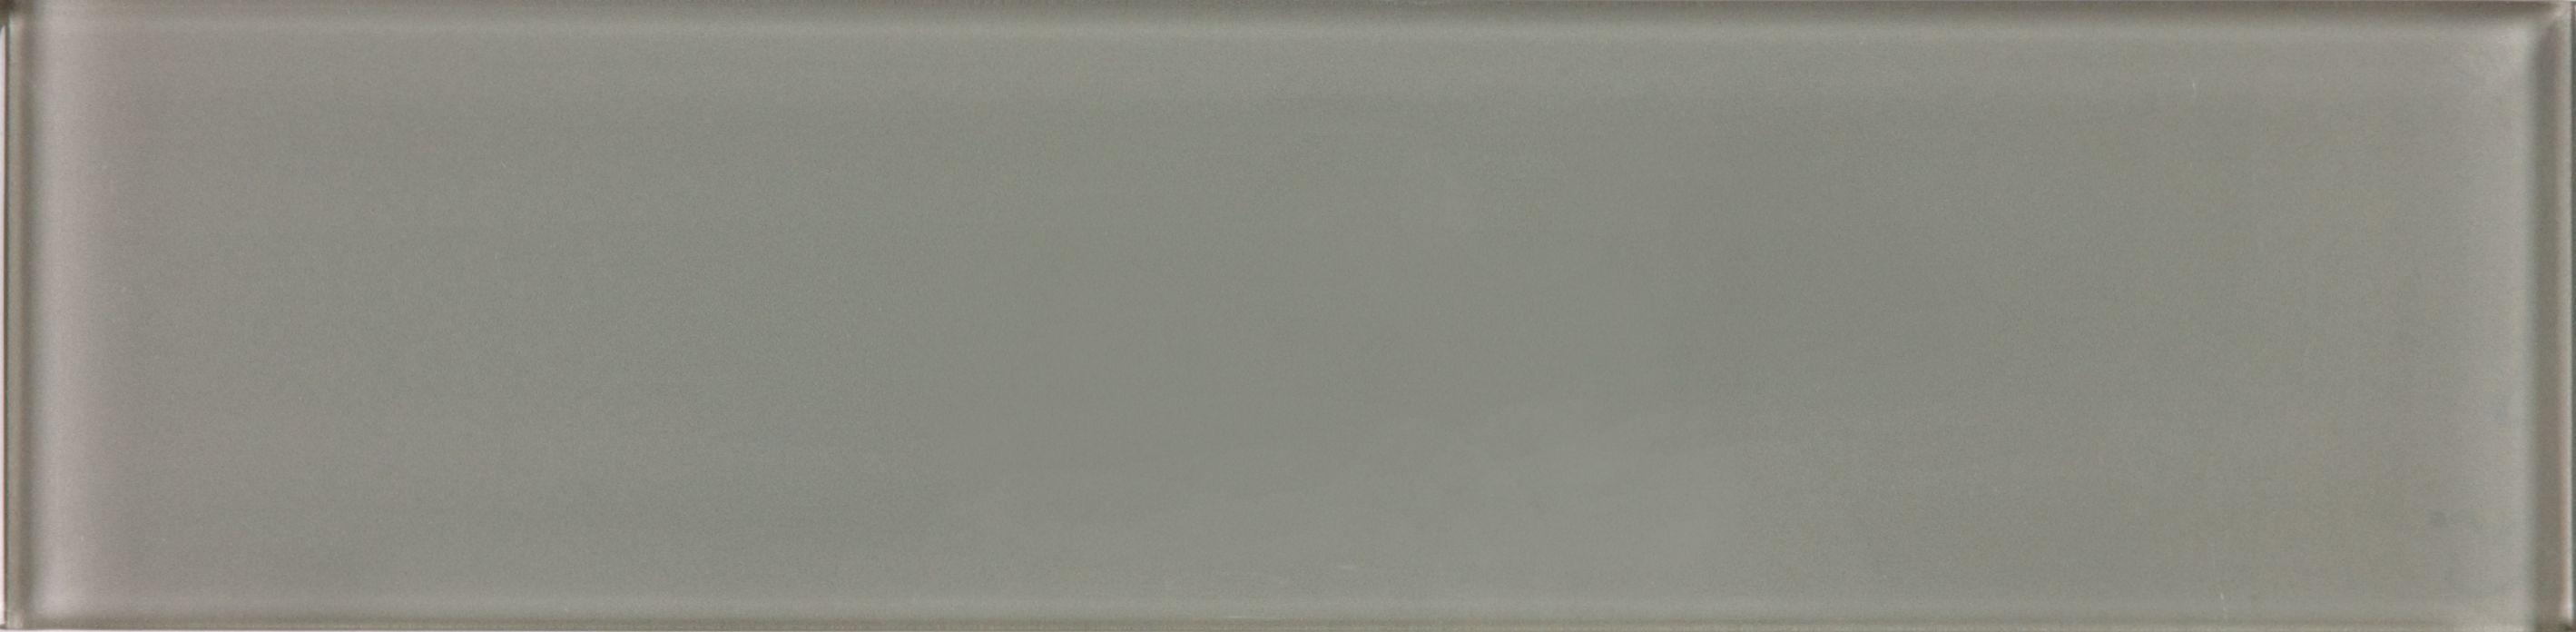 allen + roth Smoke Glass Wall Tile 3in x 12in